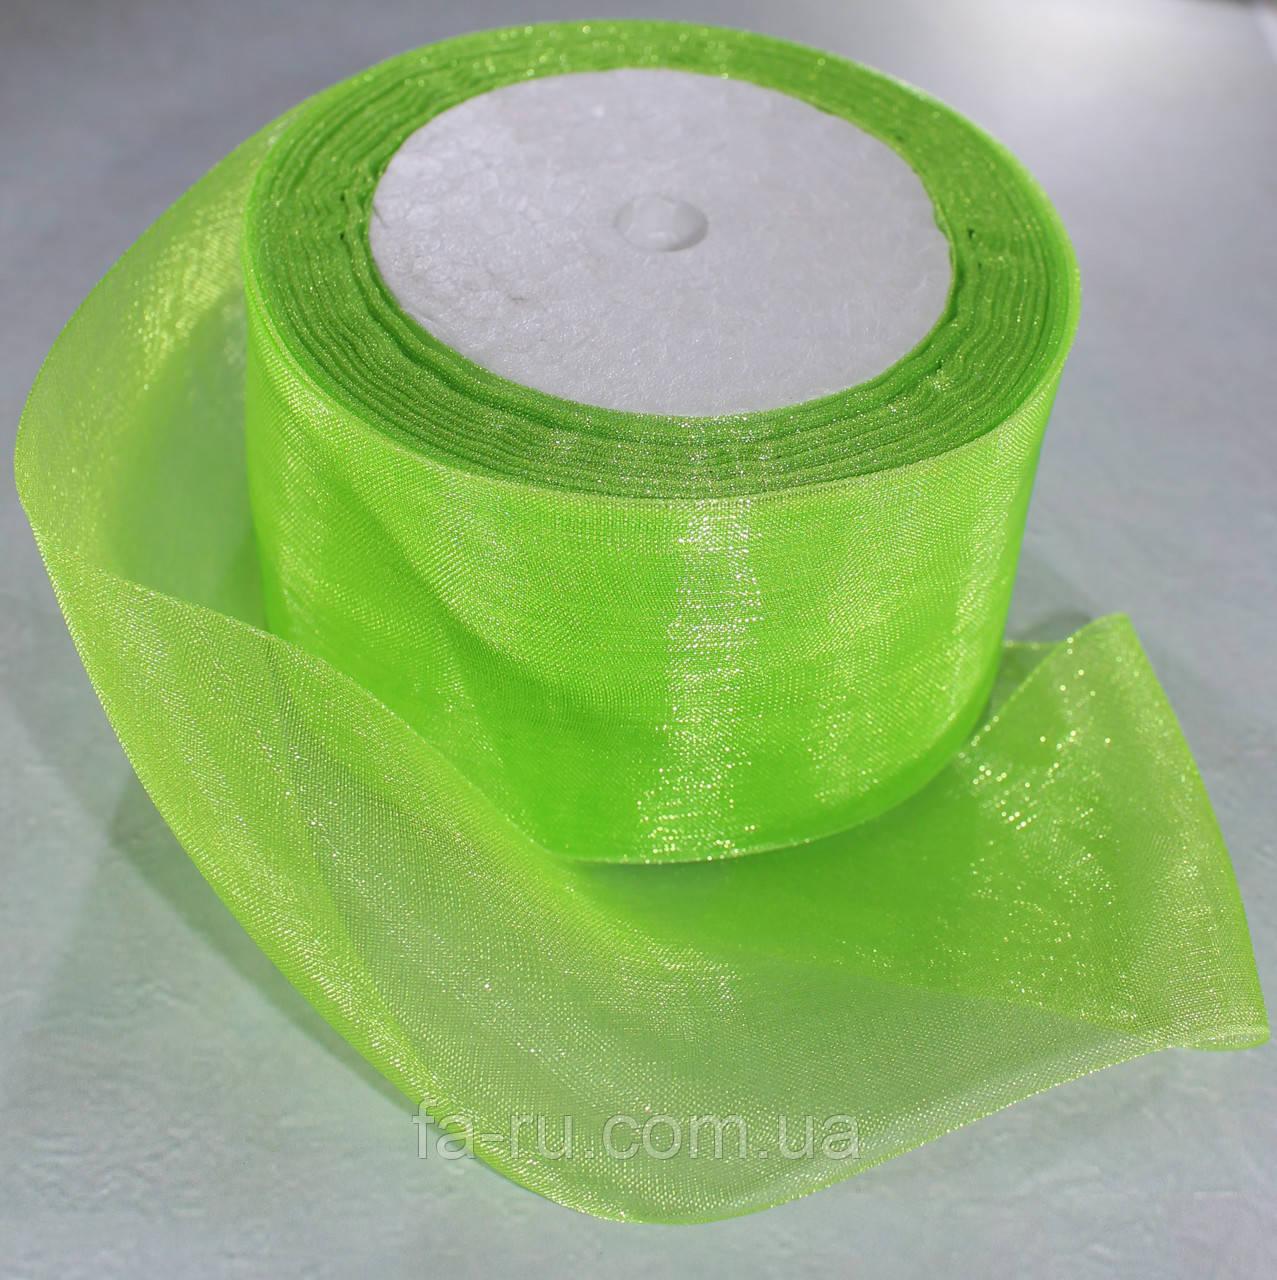 Органза лента. Цвет - зеленый. Ширина - 5 см, длина - 25 м